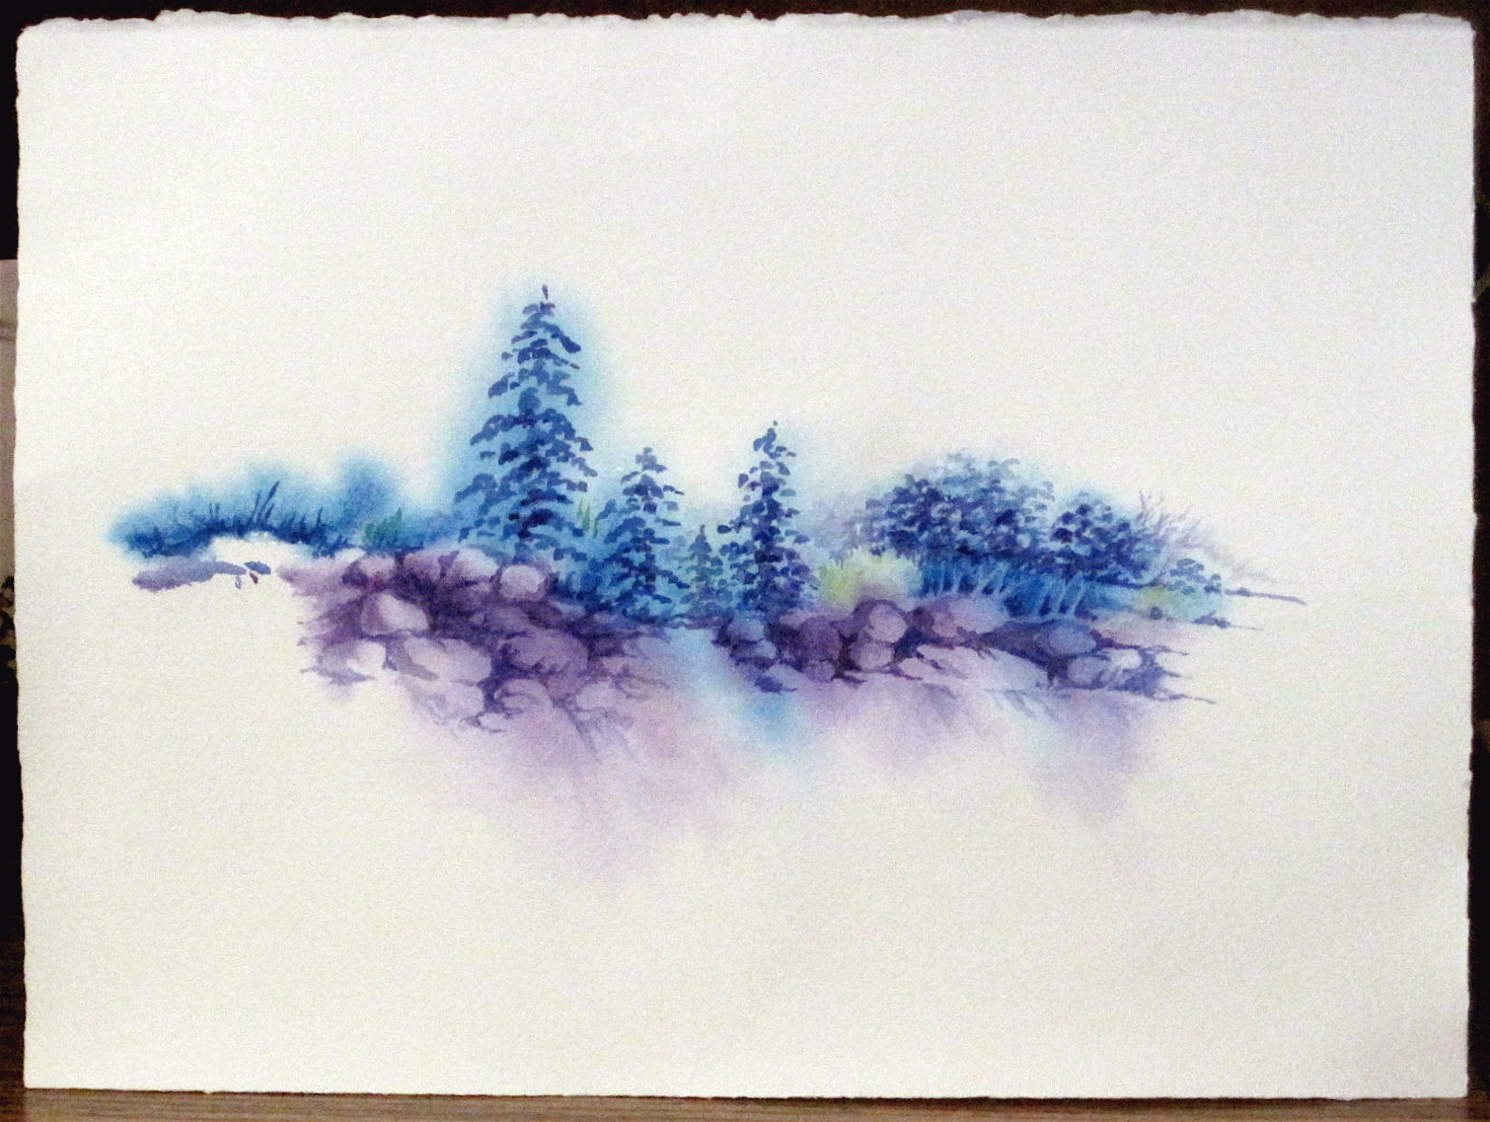 Cool reflections ren e goularte art in process for Cool watercolour